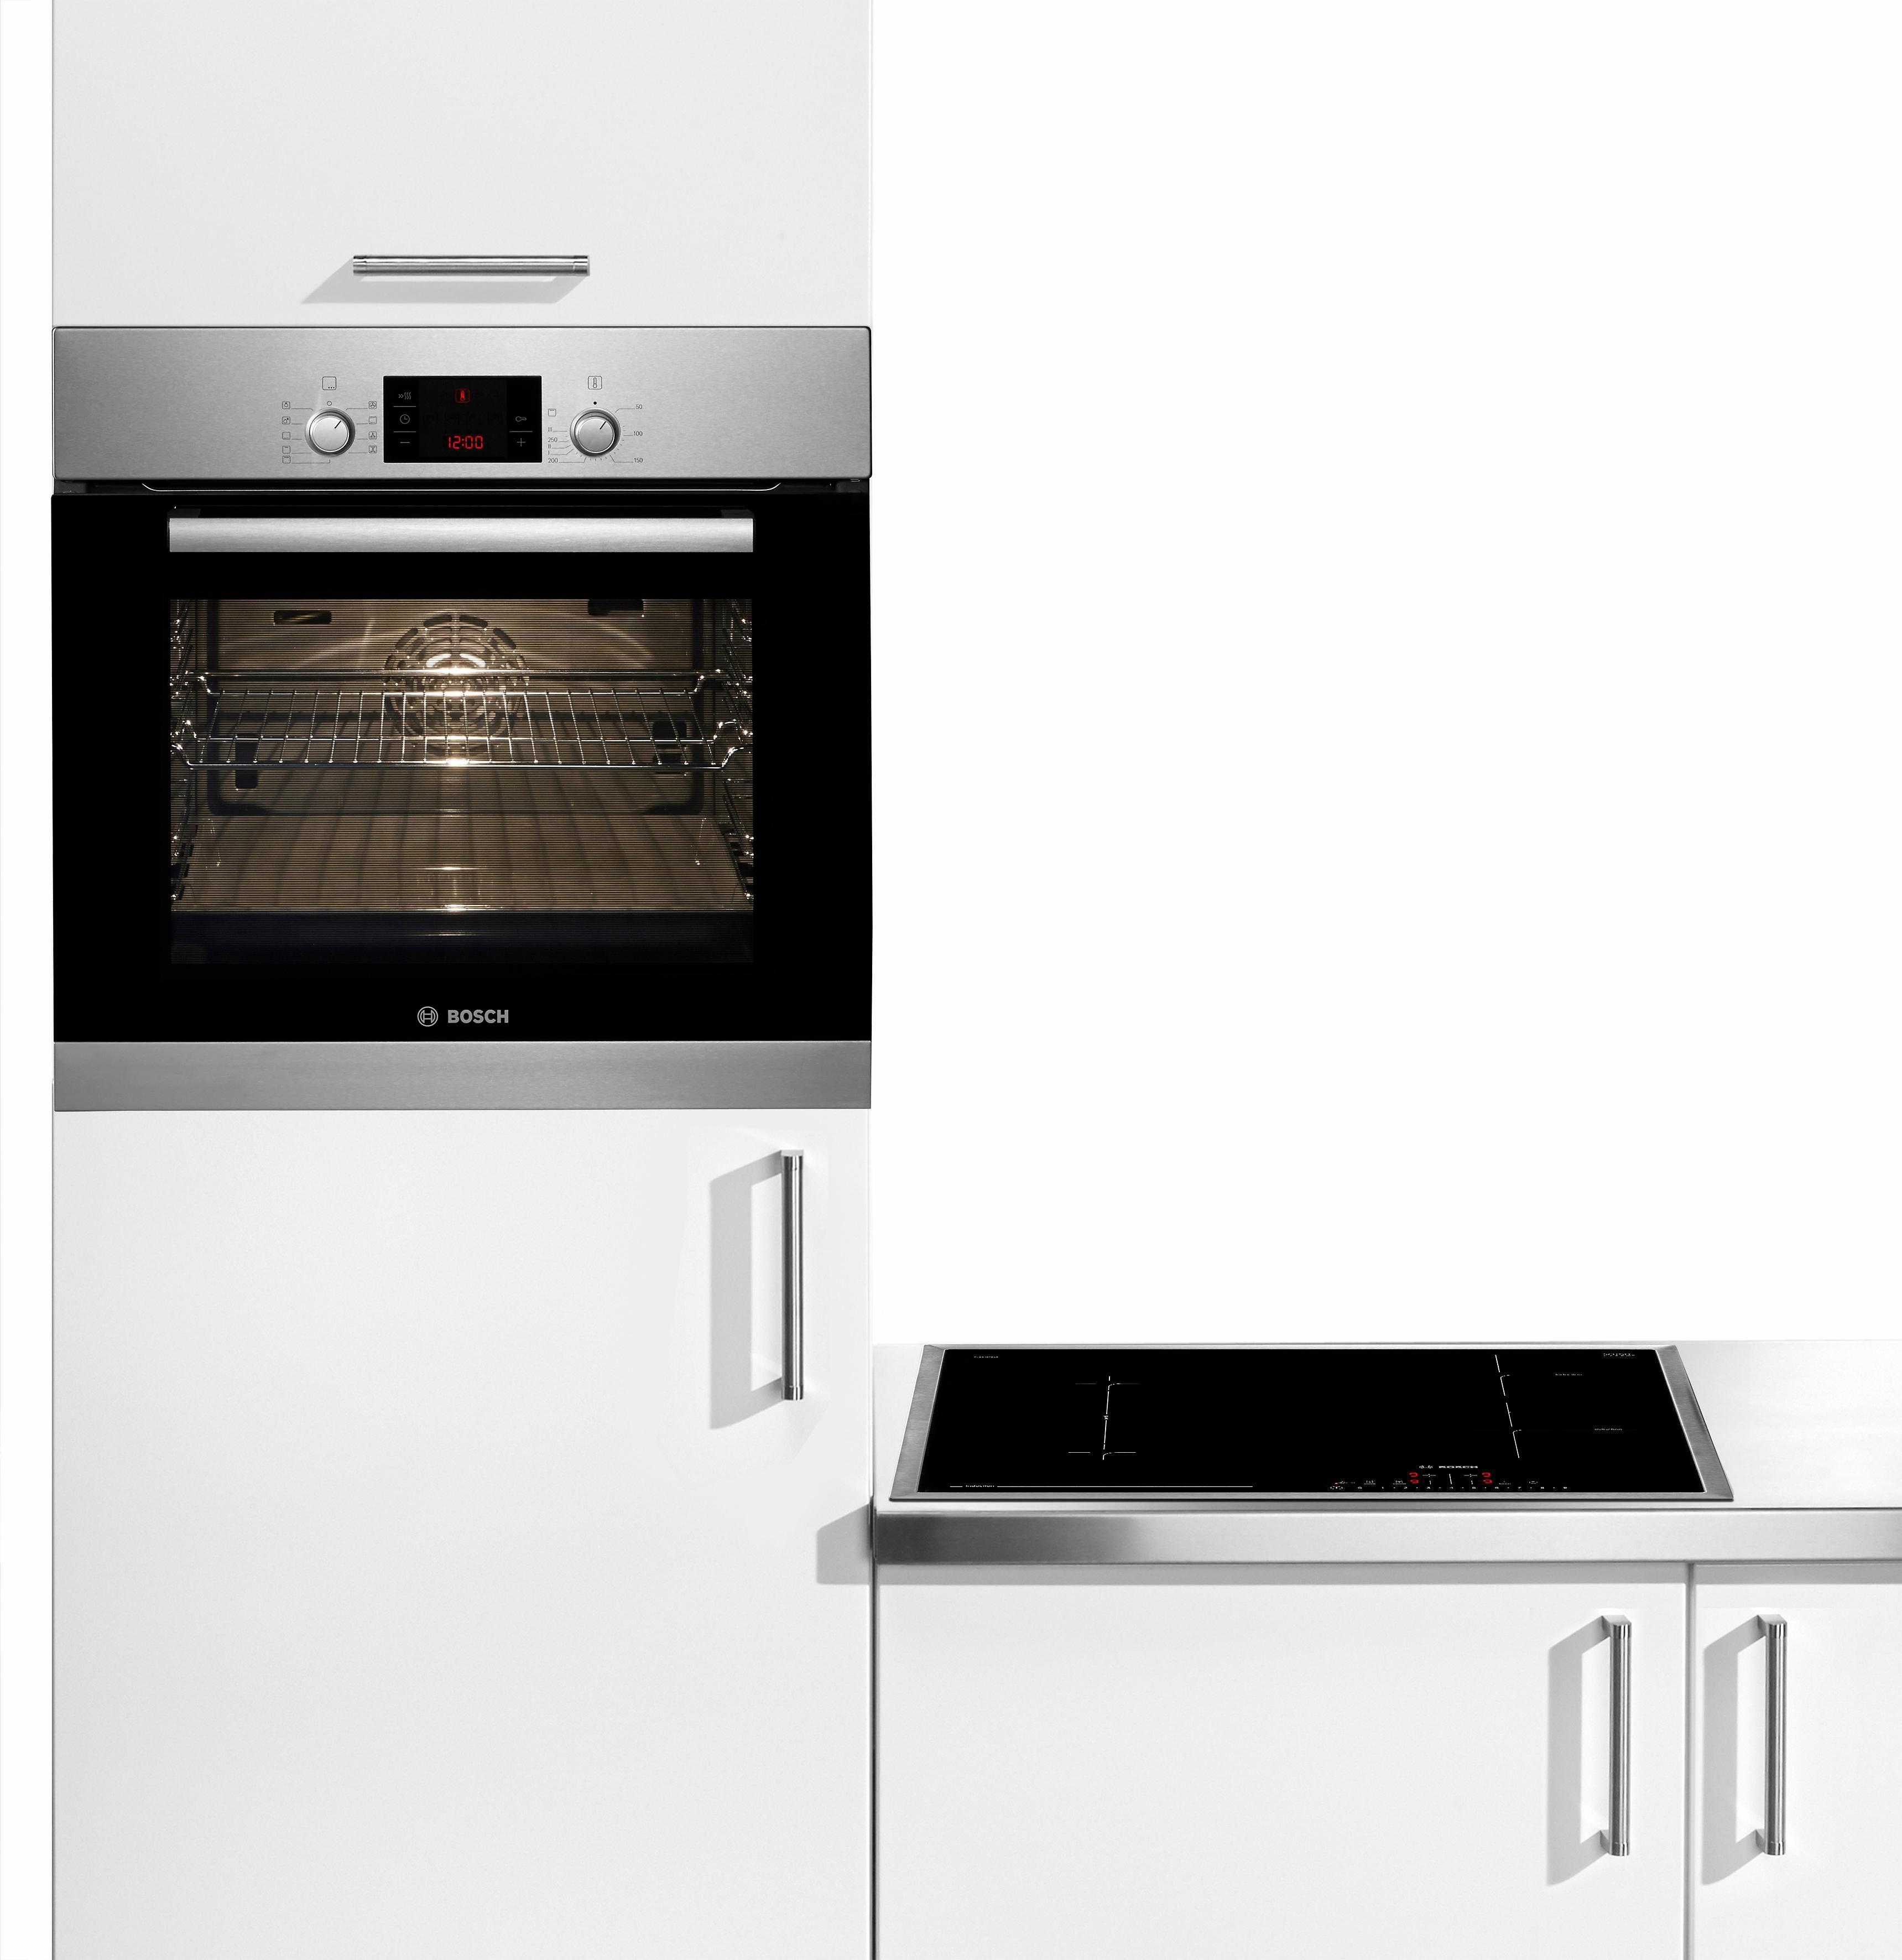 Bosch Induktions-Backofen-Set HBD31PC51, Energieklasse A